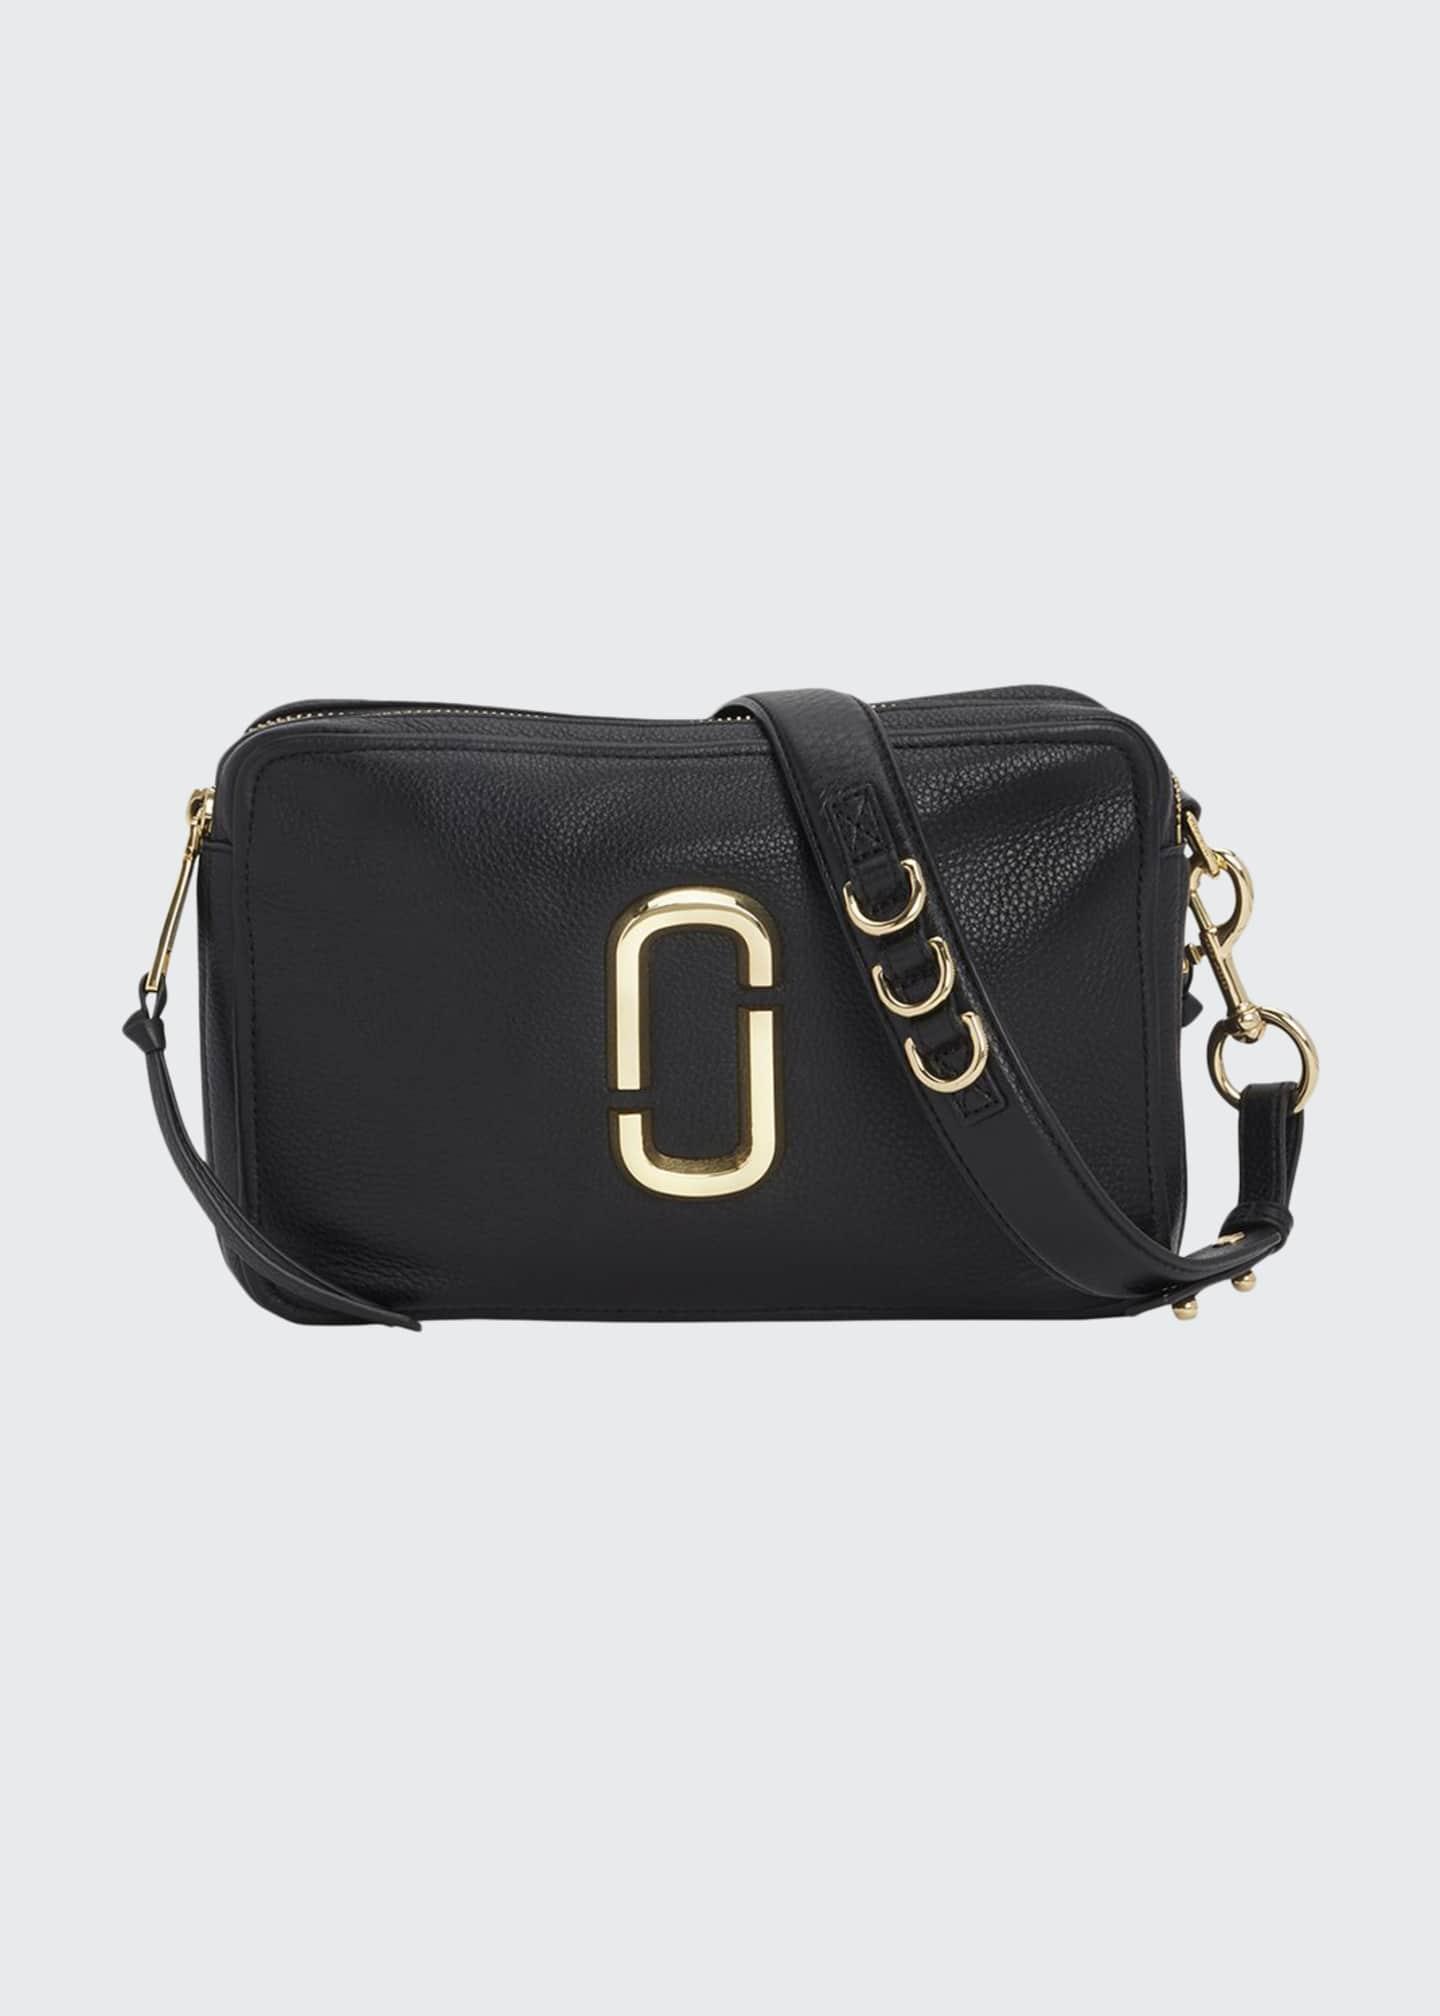 The Marc Jacobs The Softshot 27 Crossbody Bag